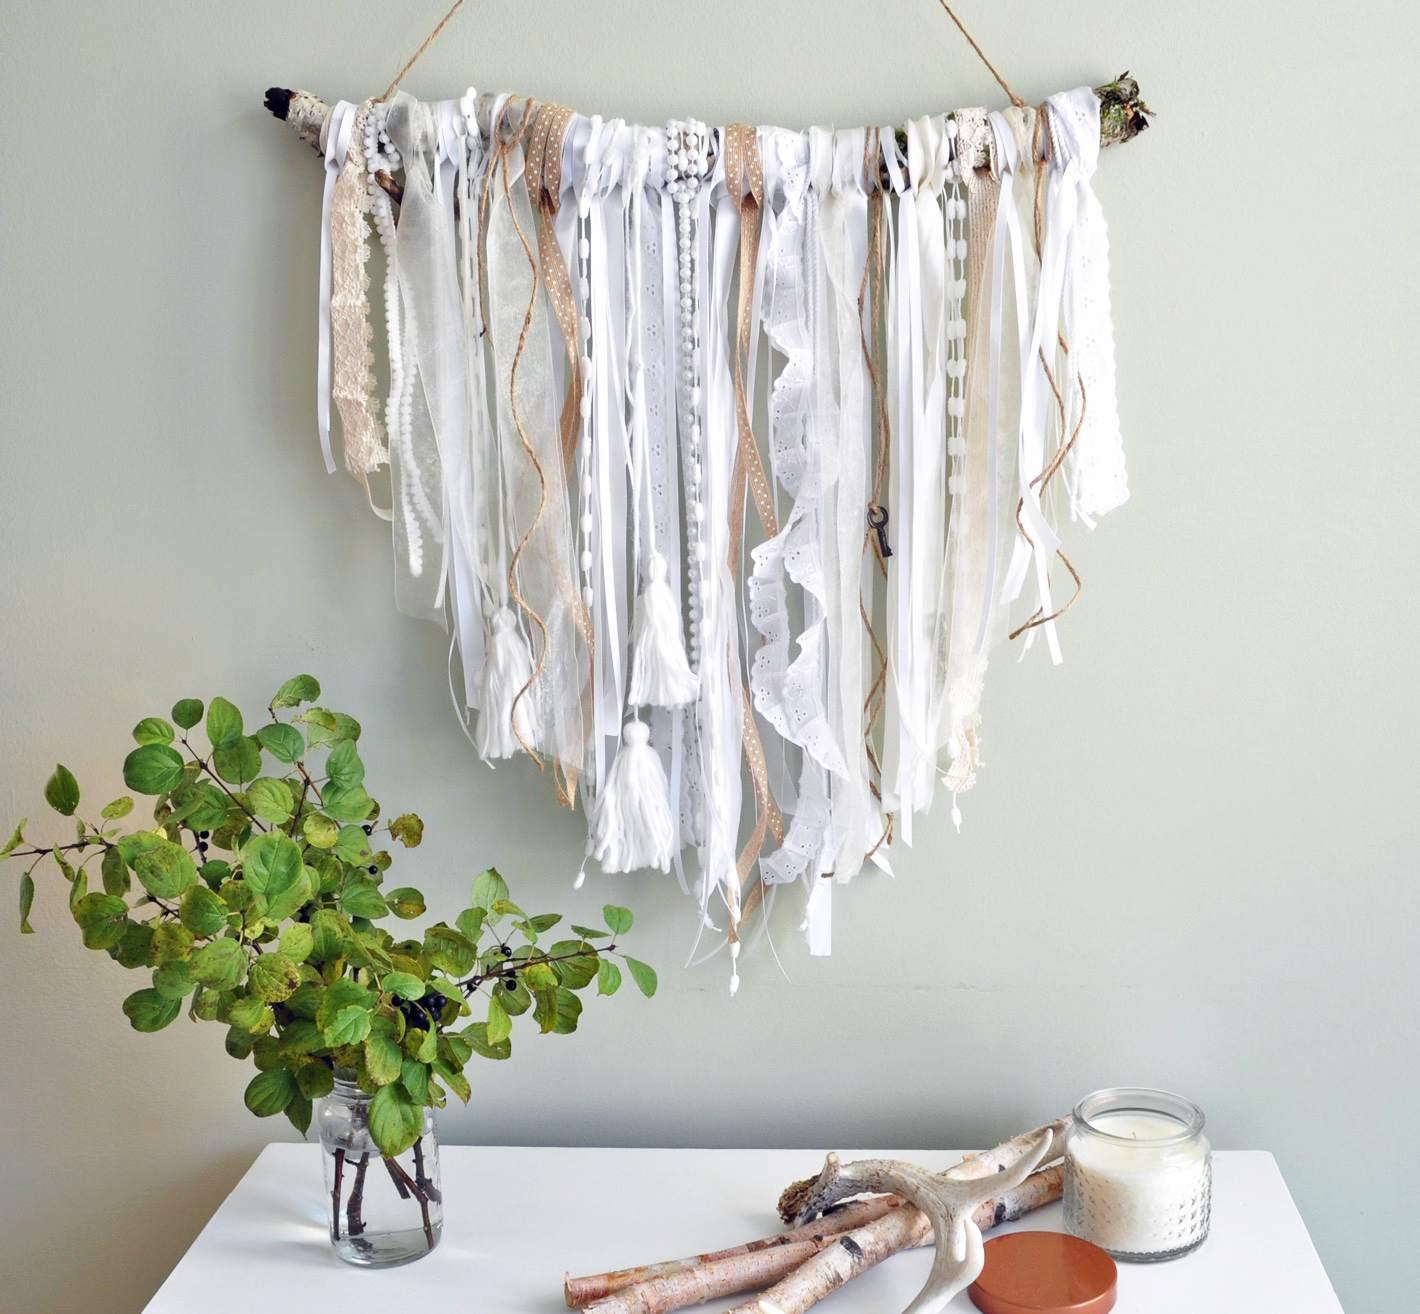 DIY Shabby Chic ribbon wall hanging